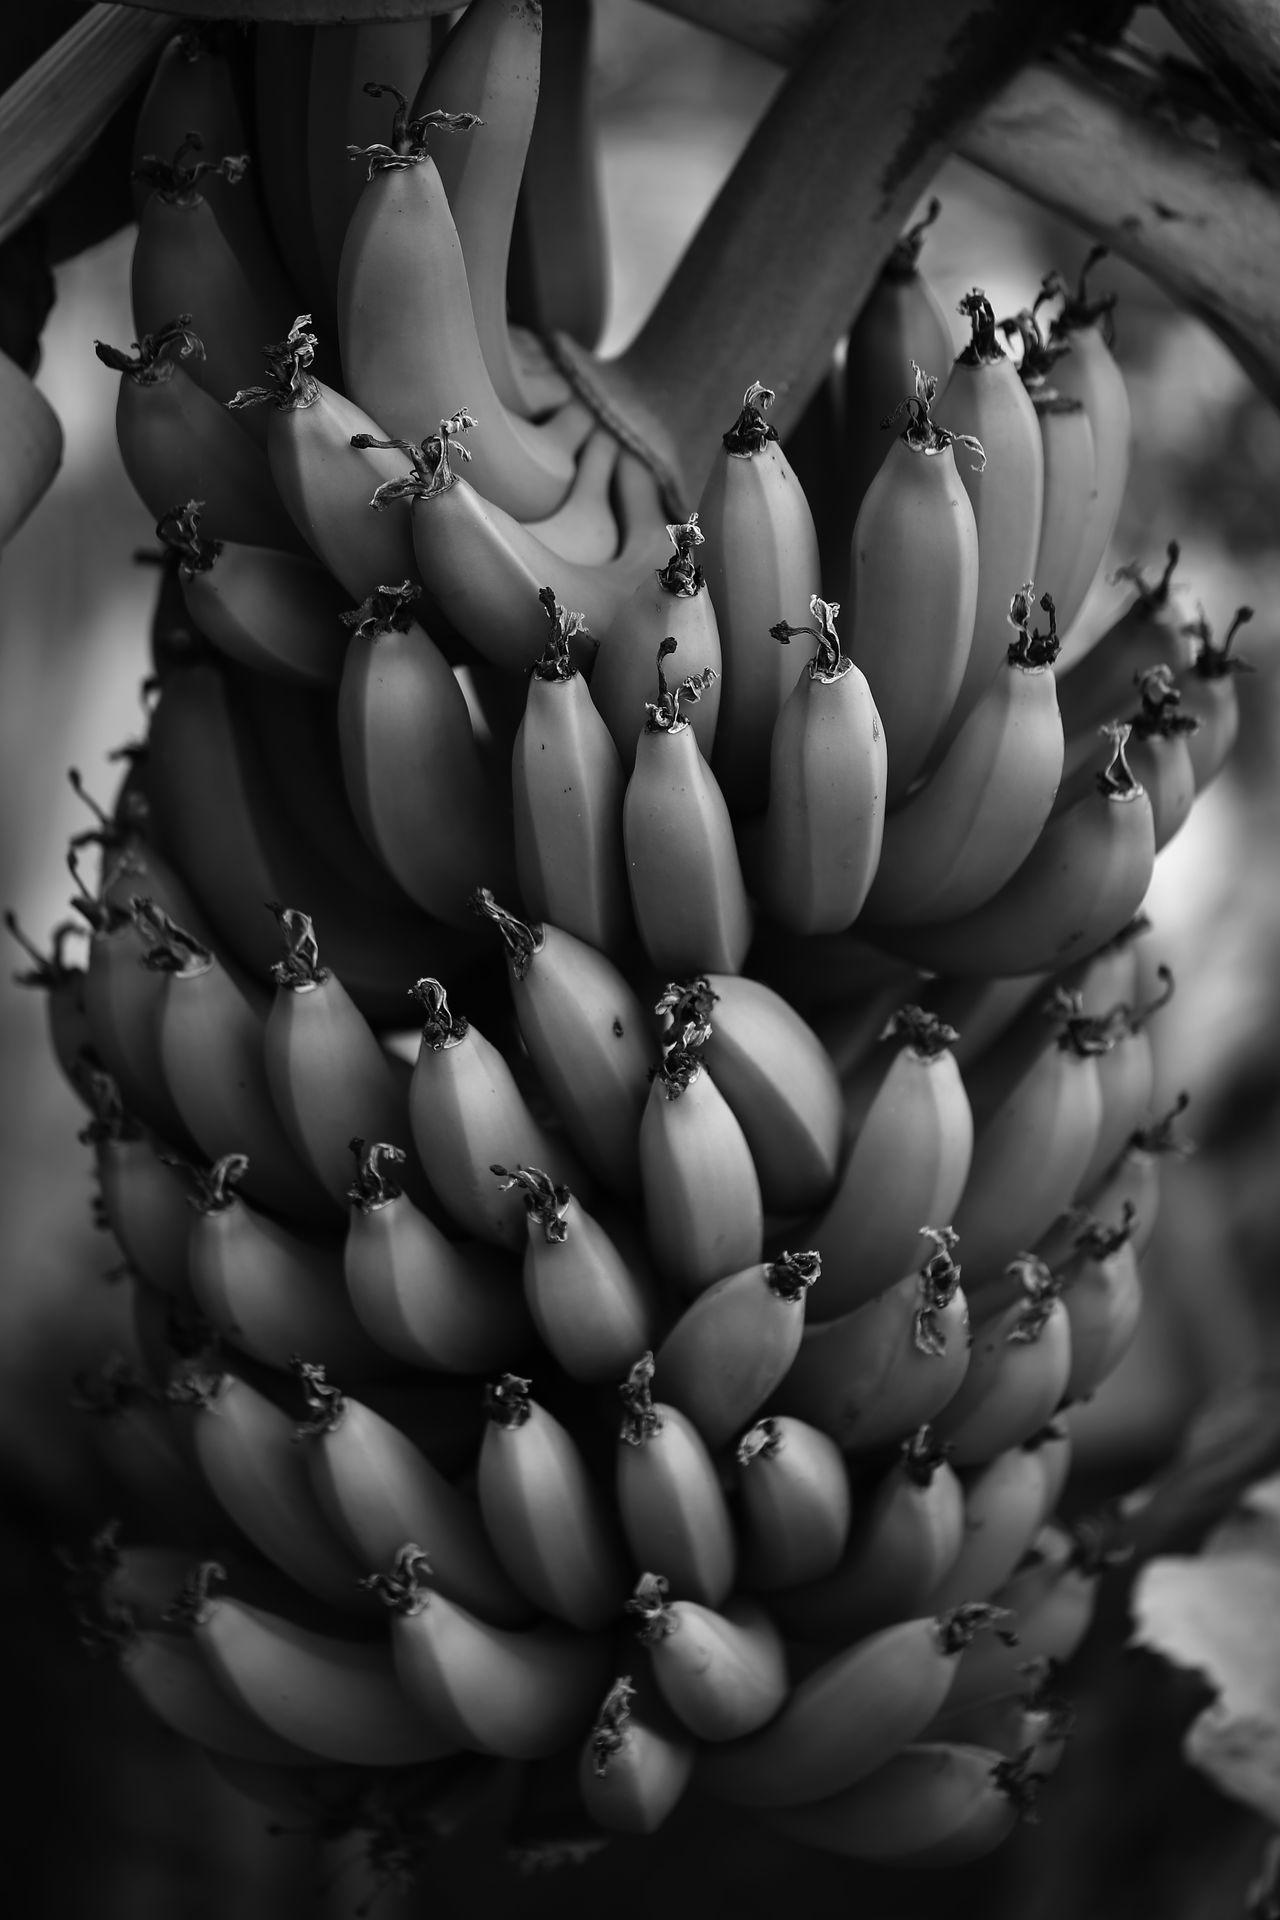 Abundance B&w Banana Fruit Fruits Healthy Eating Ile Intense Reunion Island Régime